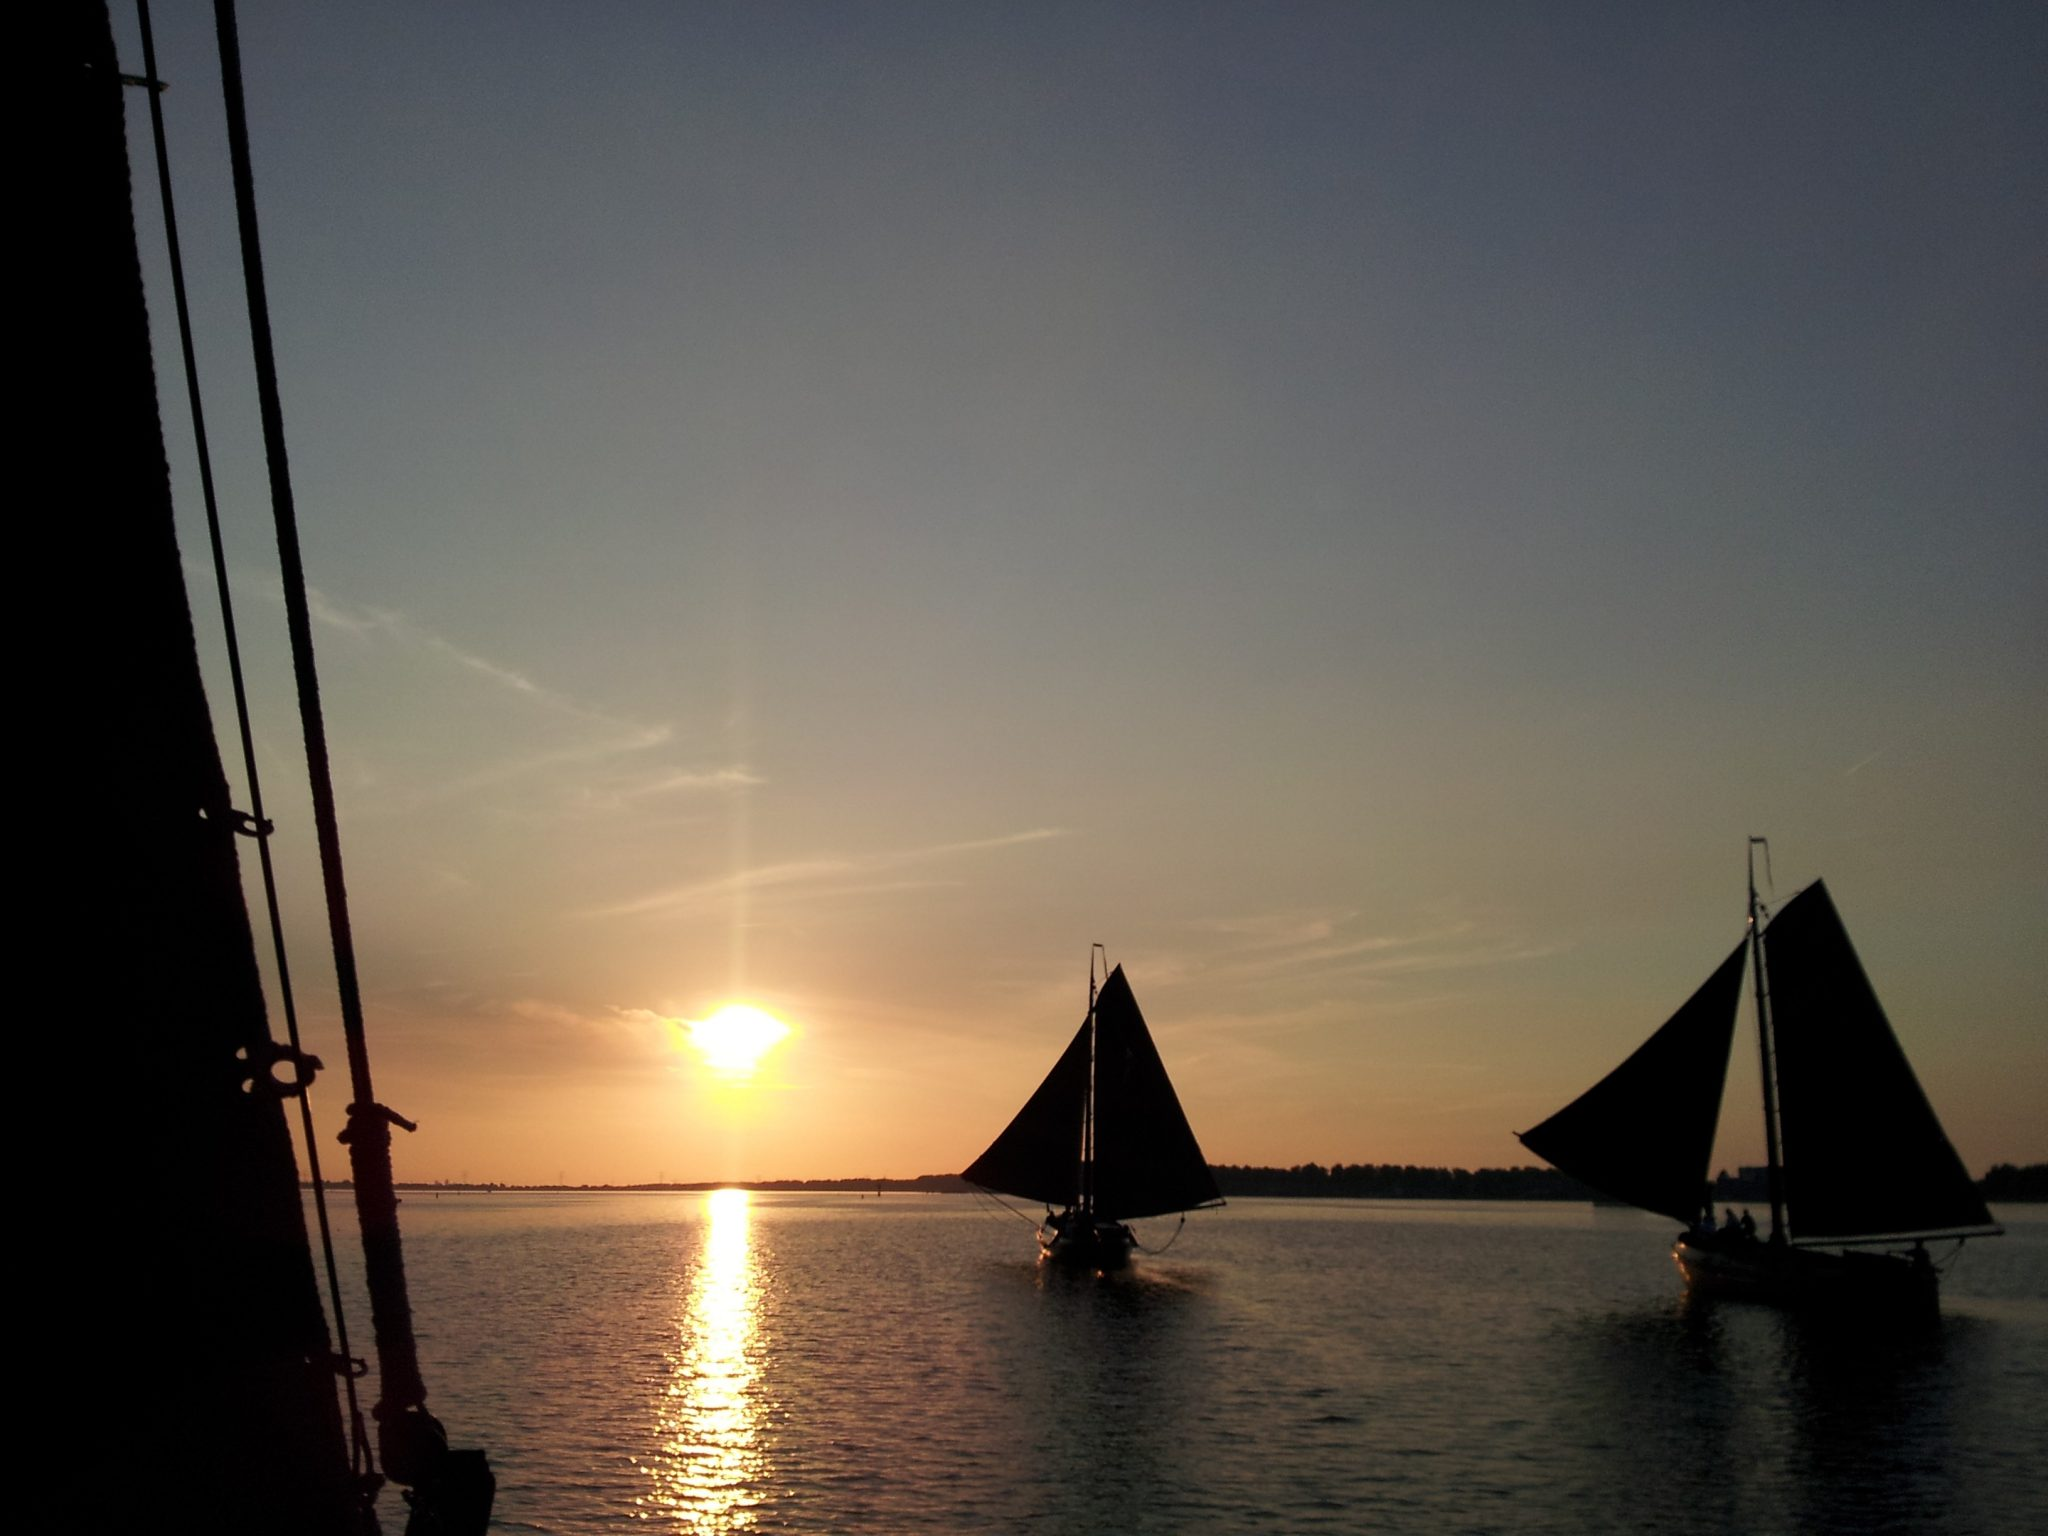 Overstag column zomeravondwedstrijd for Driften betekenis